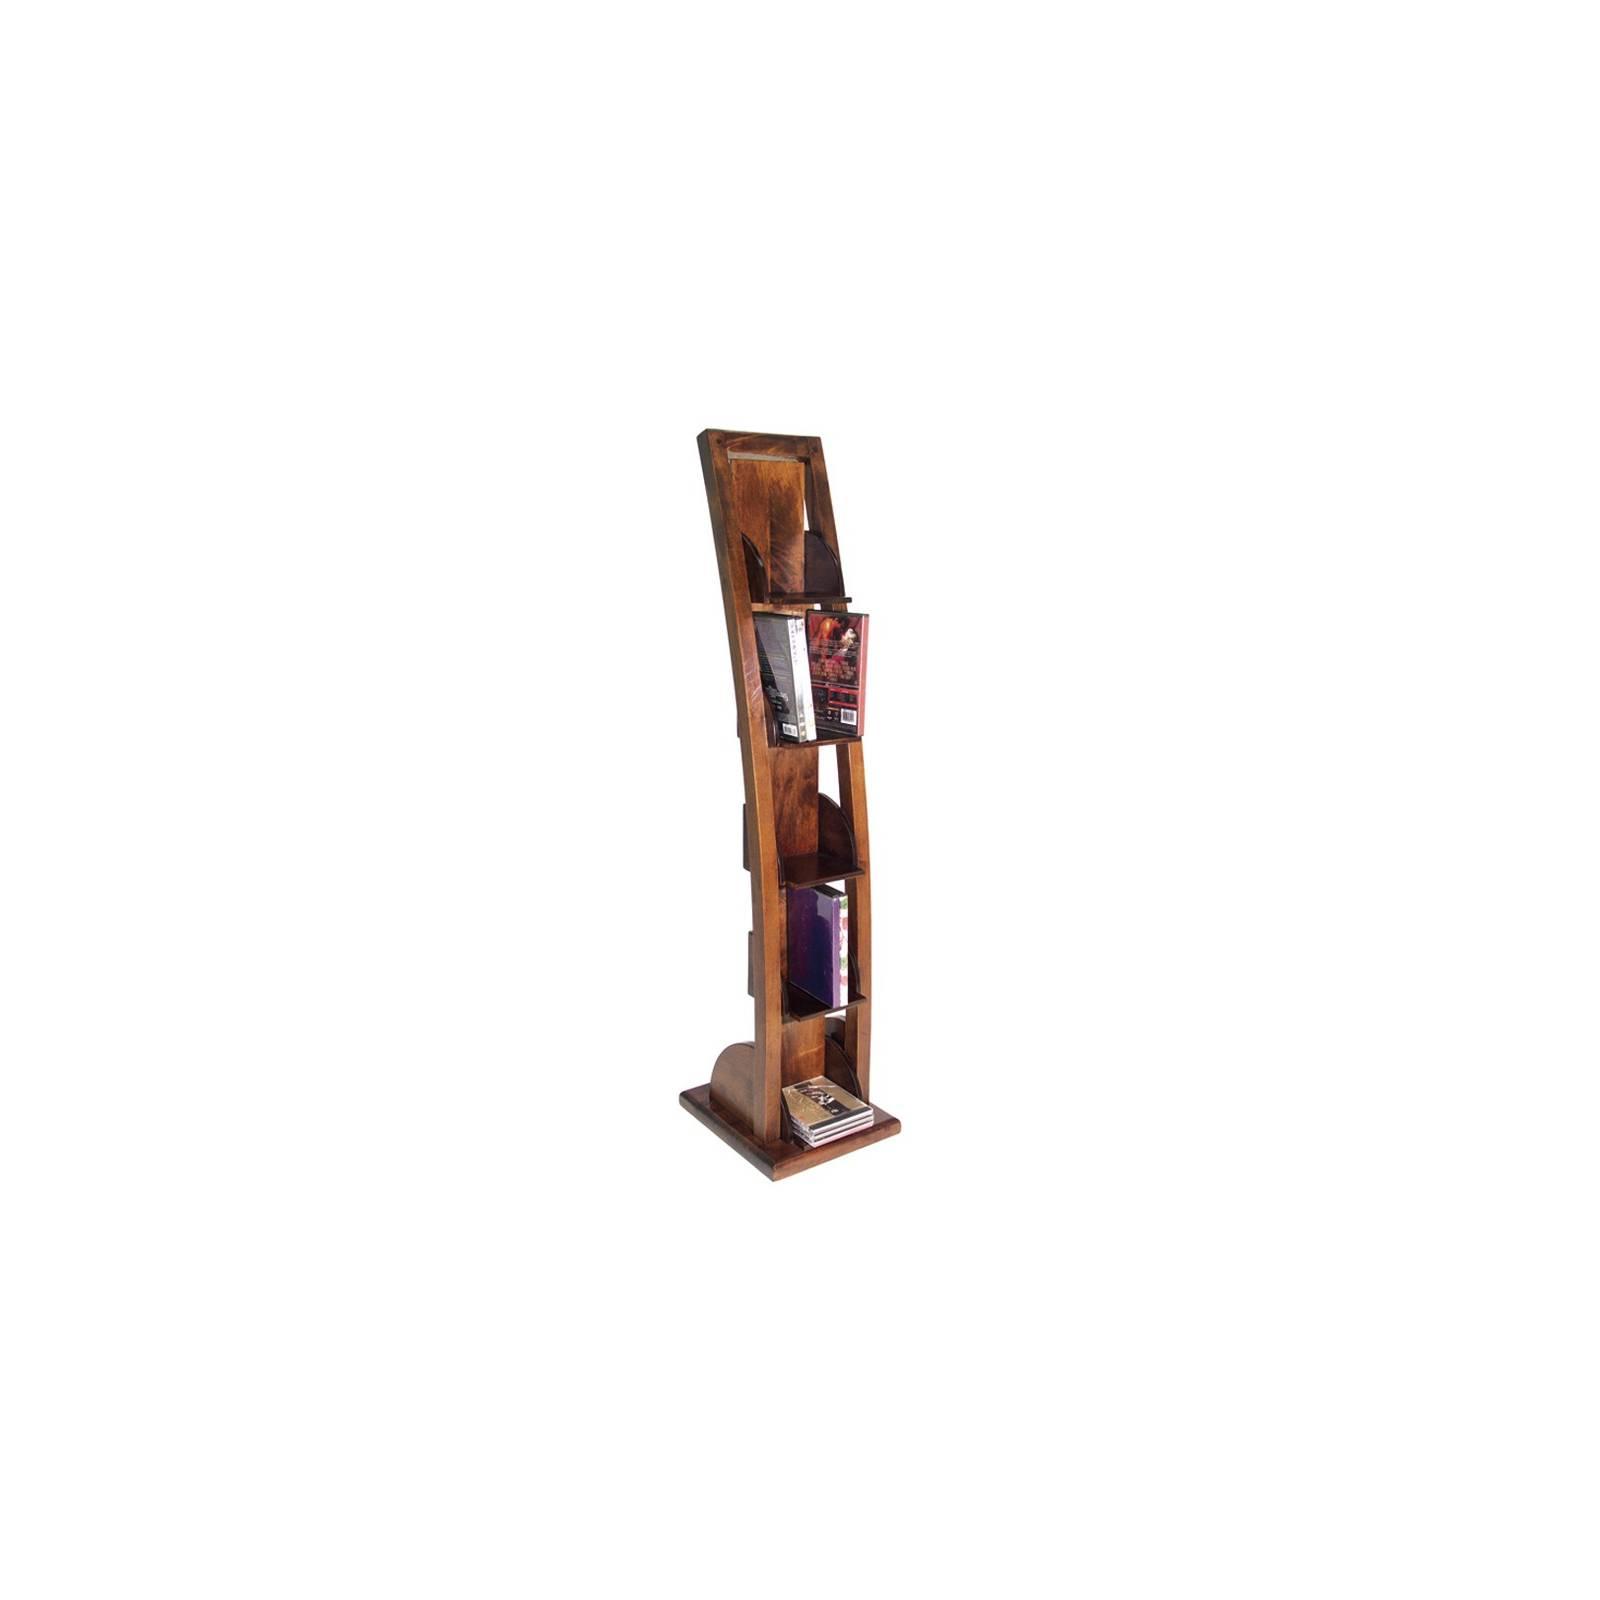 Meuble dvd escalier chine h v a mobilier cologique for Meuble escalier bois exotique